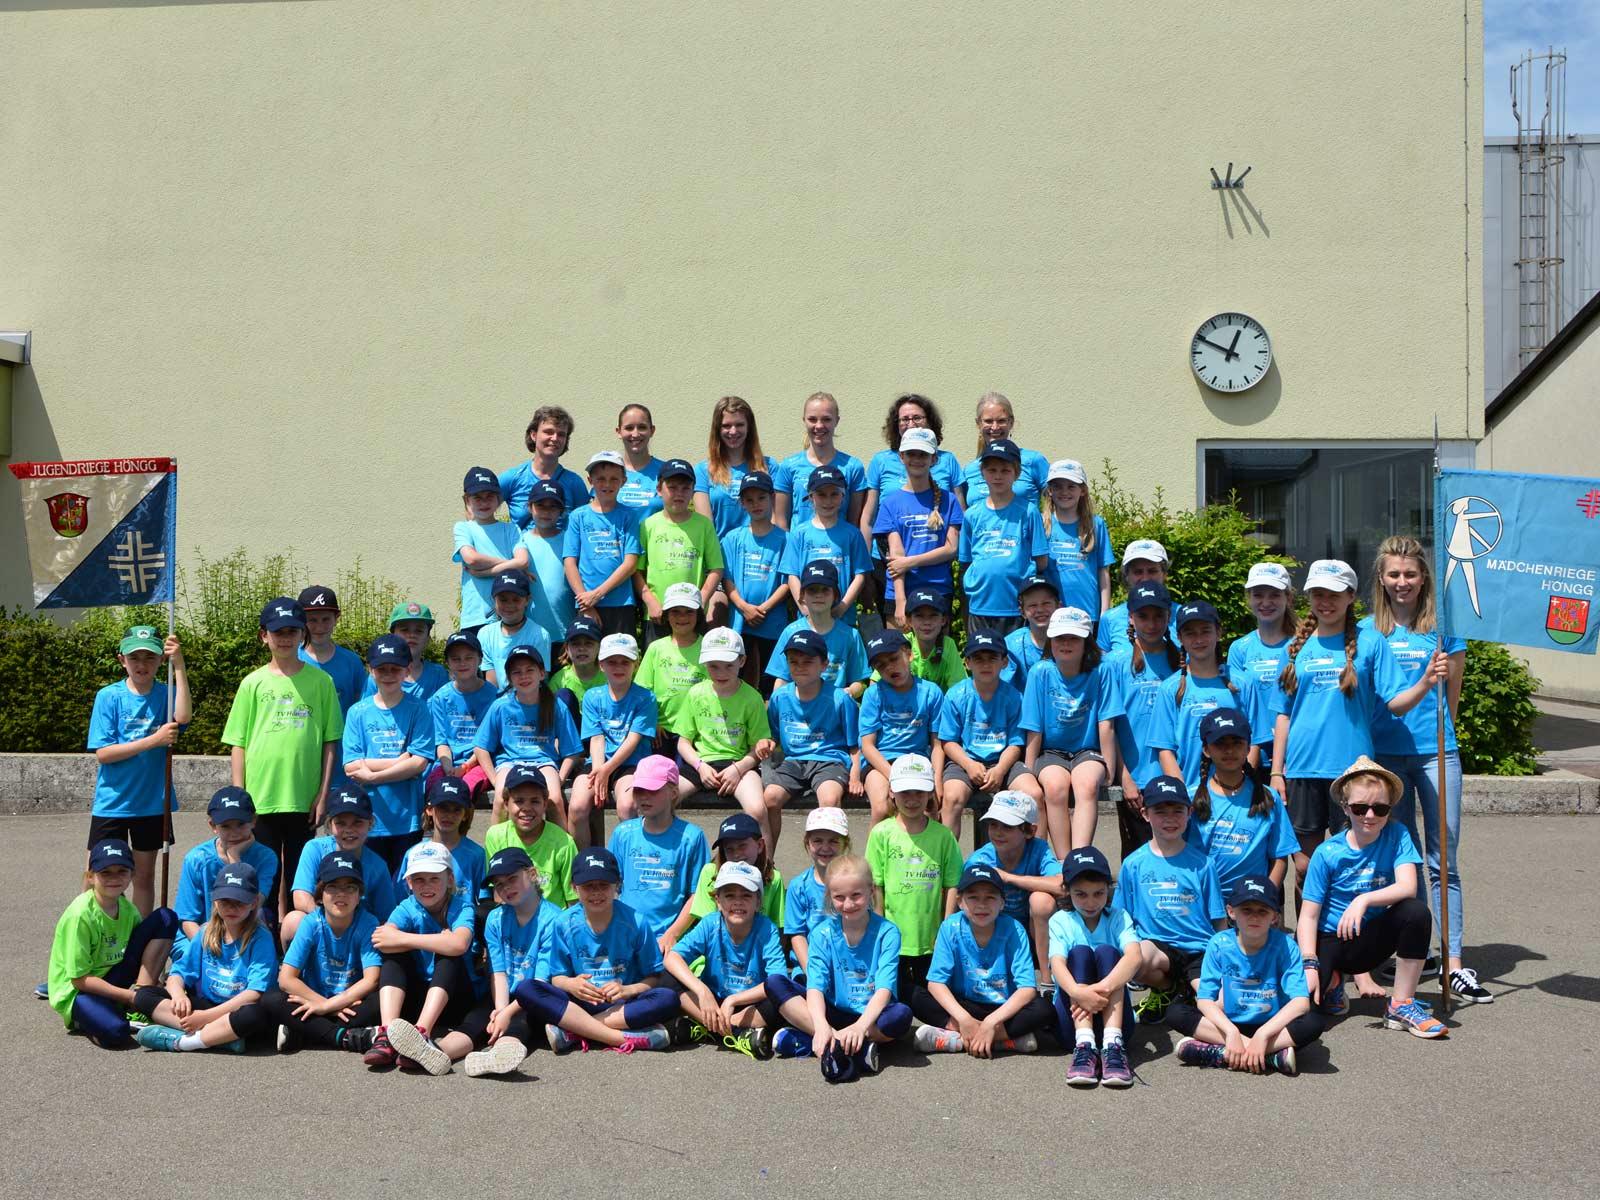 Die Kinder genossen den Jugendsporttag.